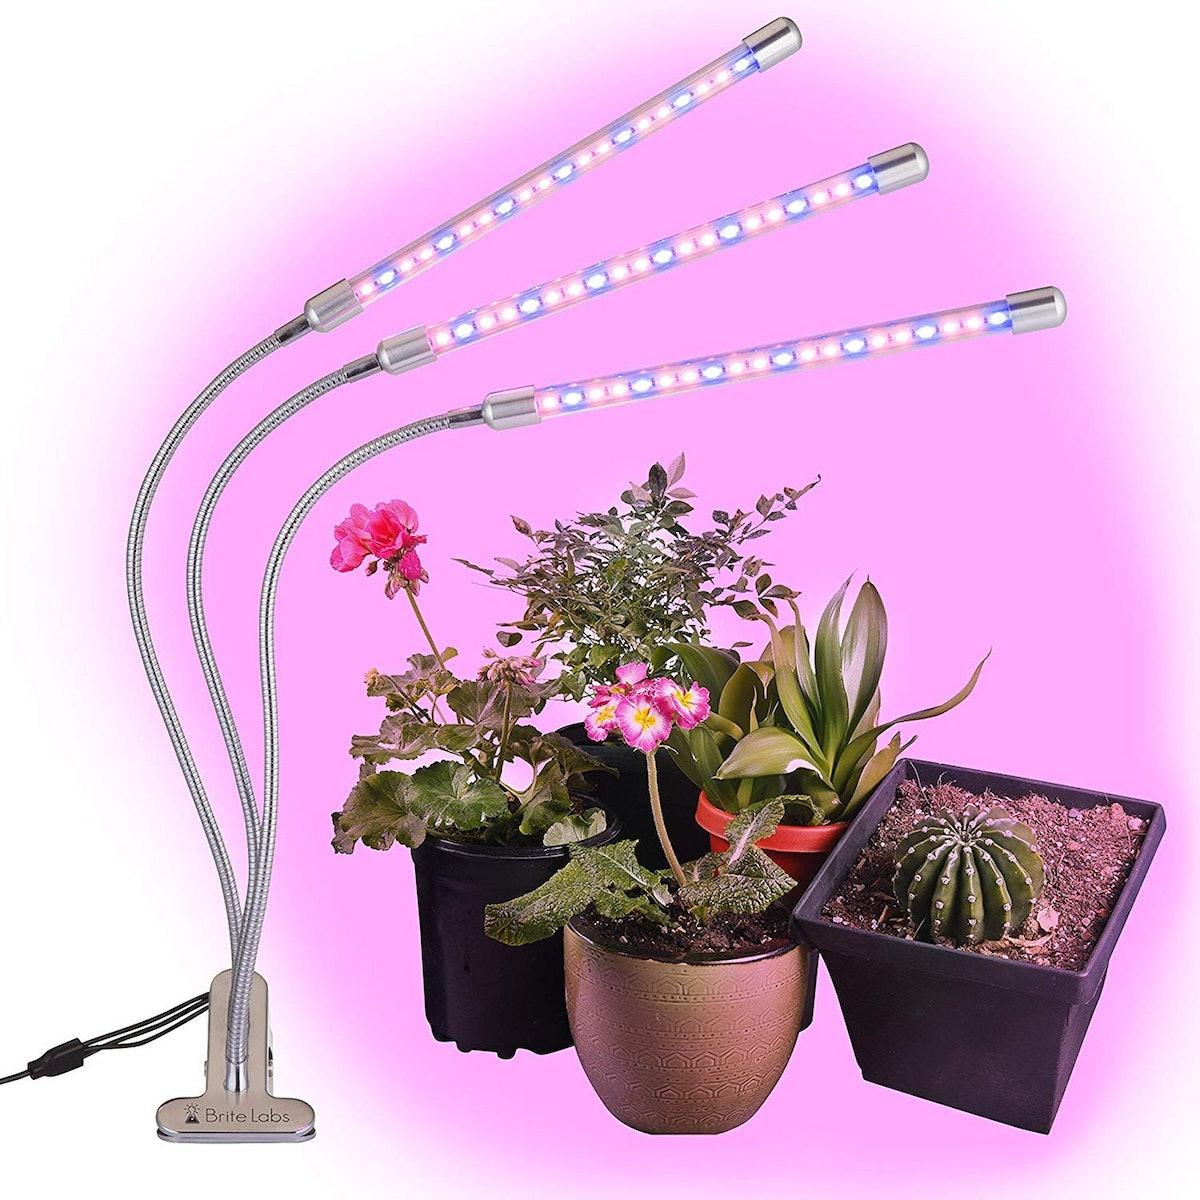 Brite Labs LED Grow Lights